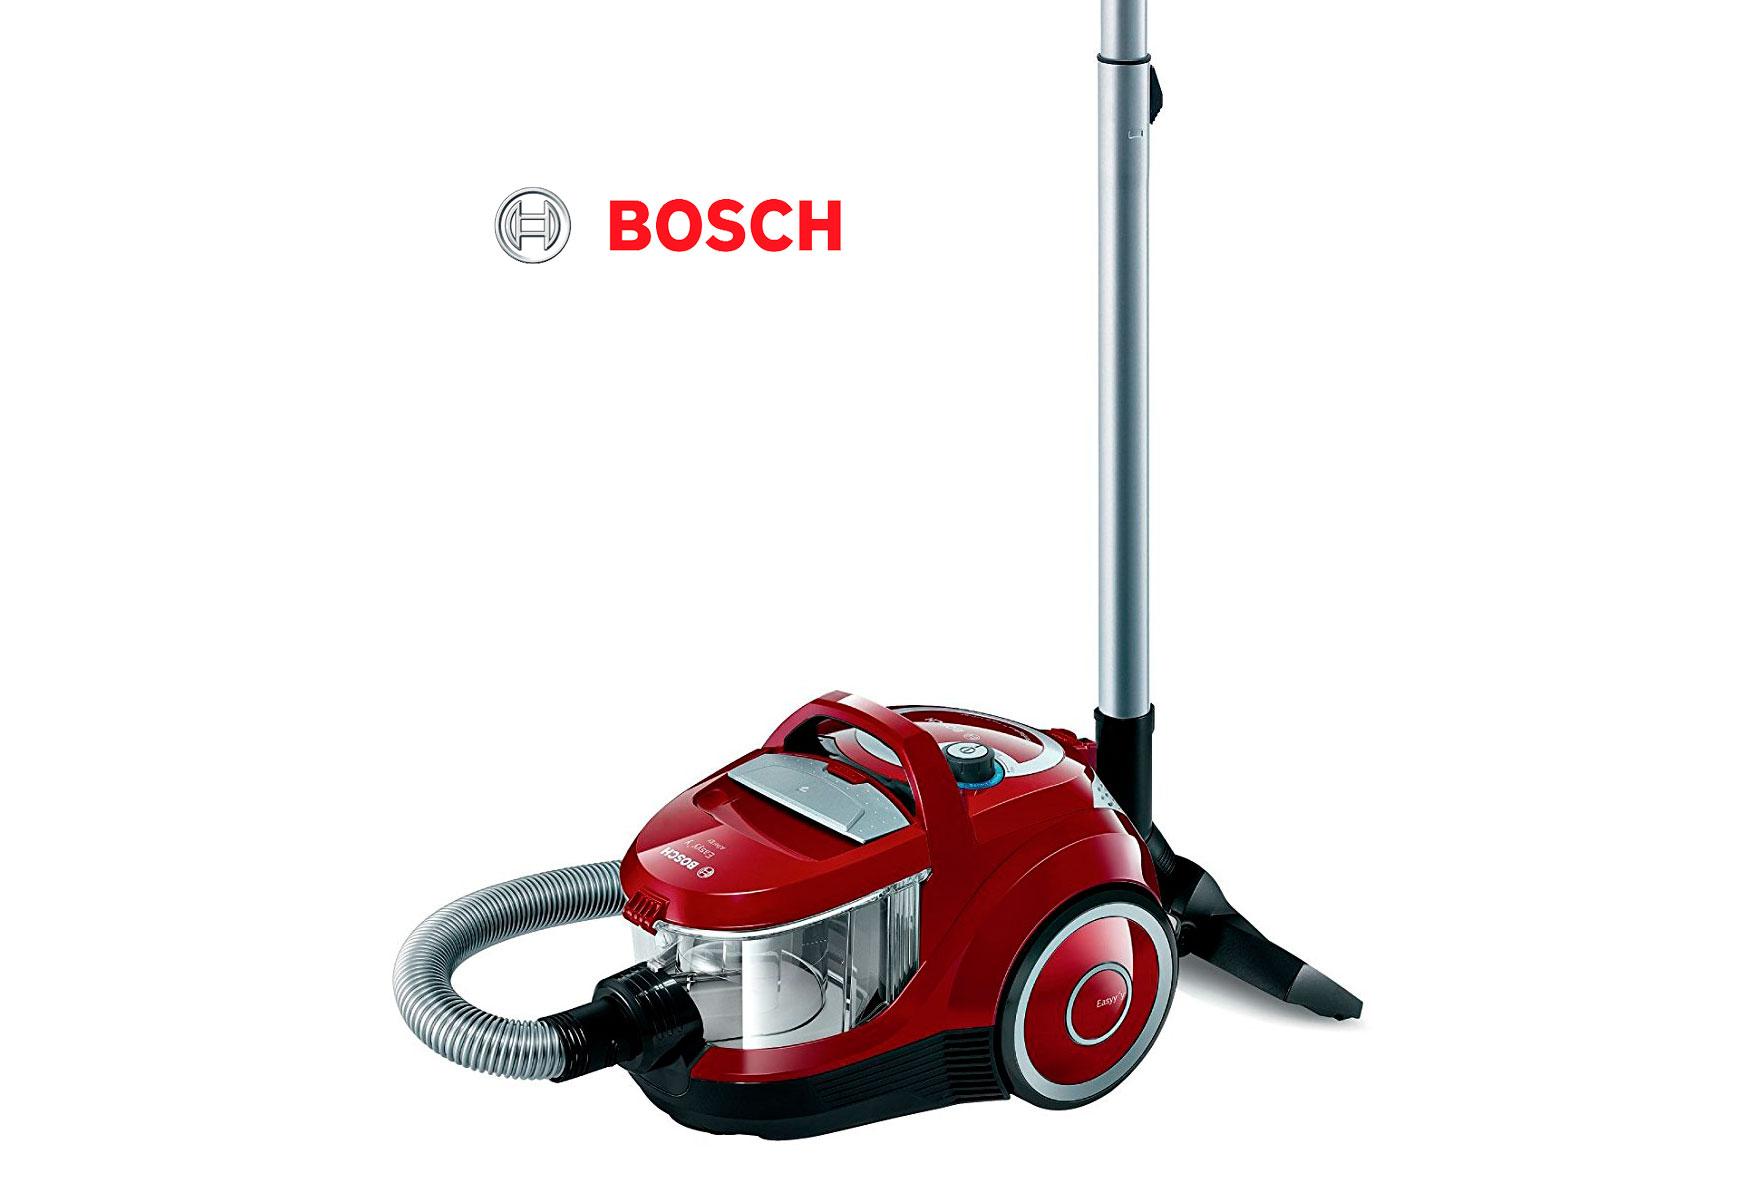 Aspirador BOSCH BGC2U230 barato oferta descuento chollo blog de ofertas bdo